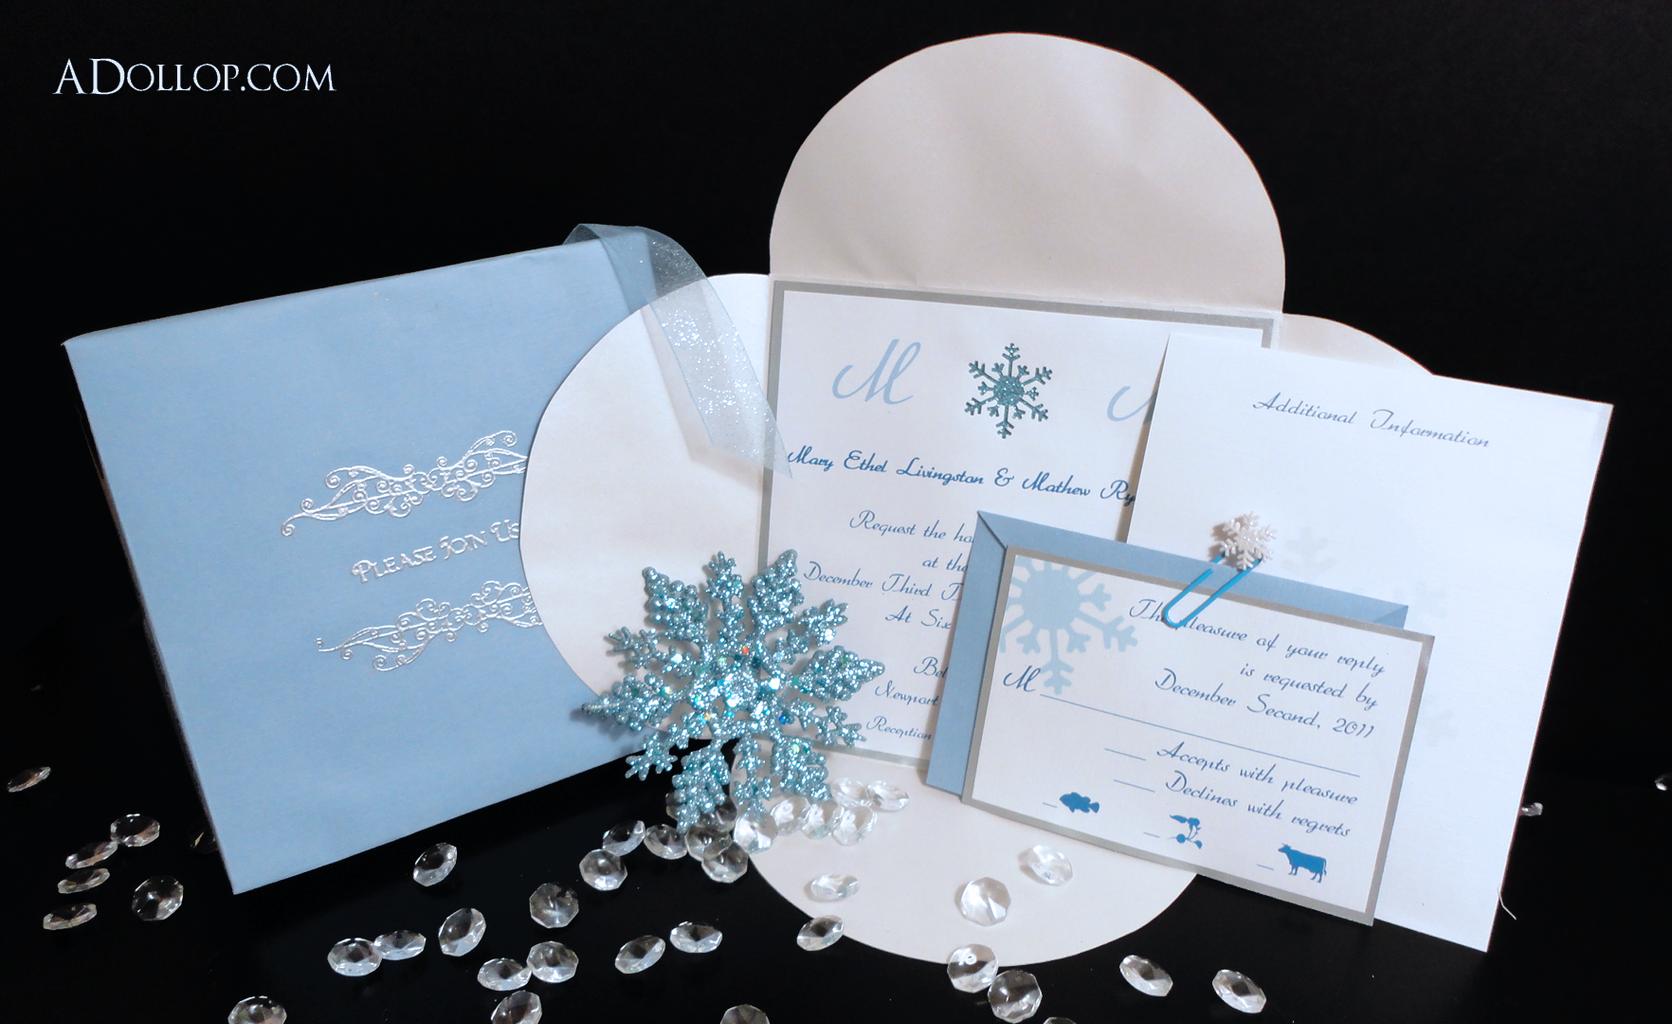 A Dollop of Inspiration | Unique Custom Wedding Invitations, Custom ...